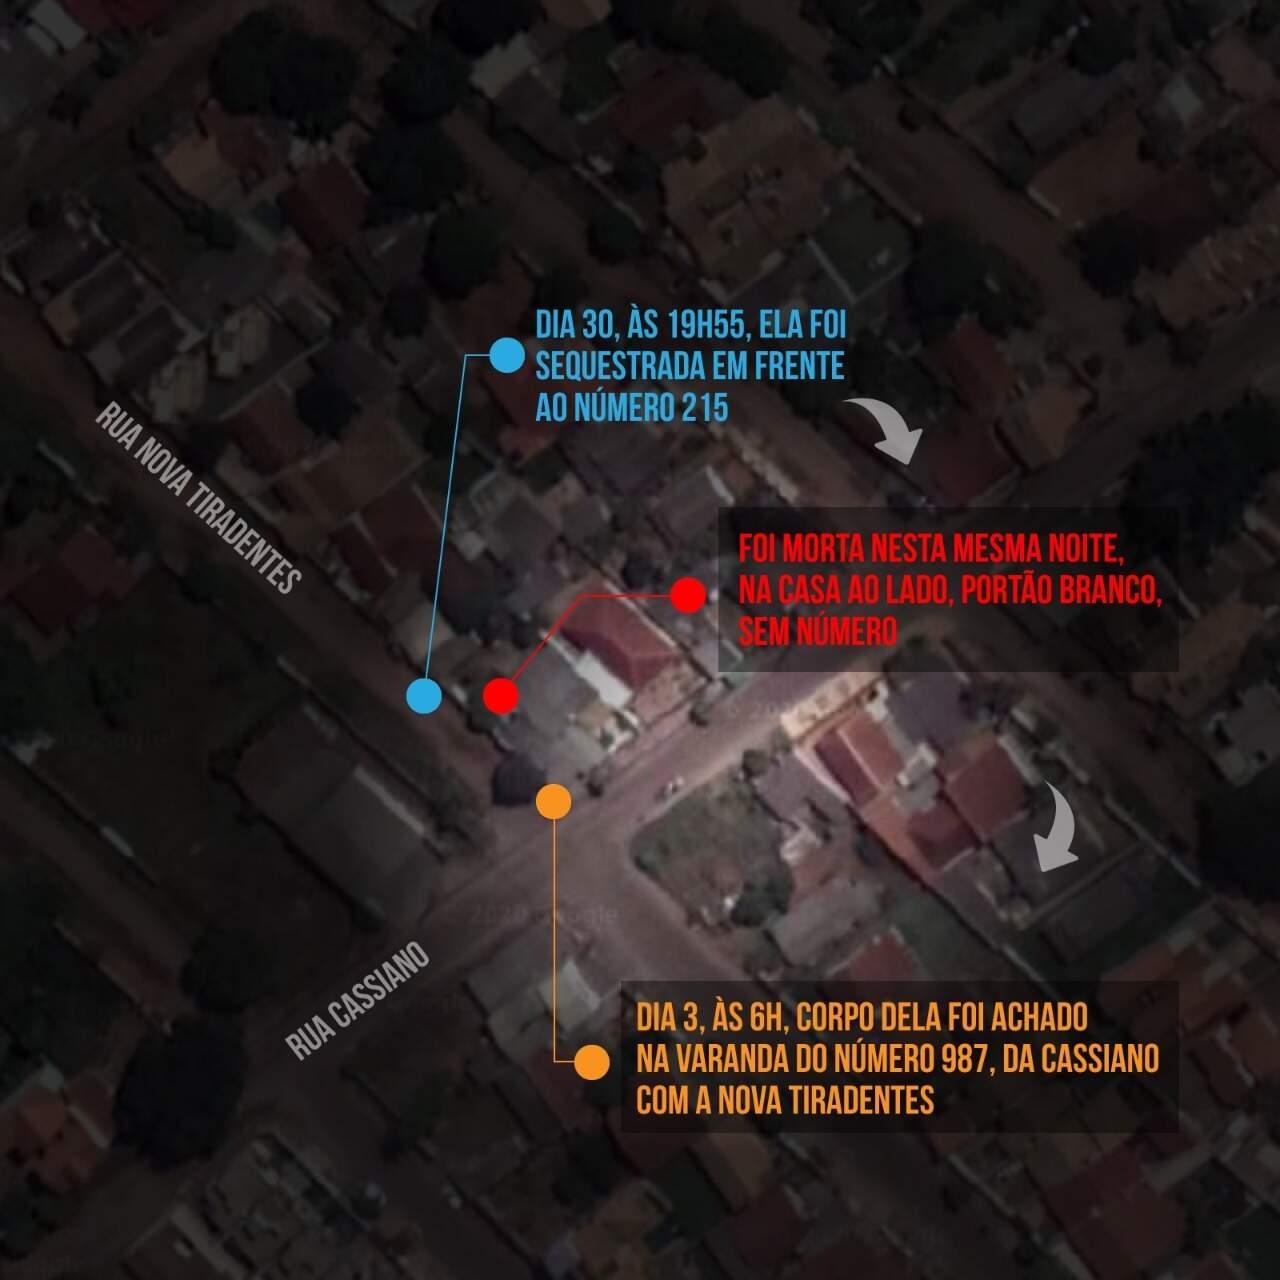 Mapa mostra proximidade entre local do rapto e lugar onde corpo foi deixado; residência de Marcos André fica no meio (Arte: Thiago Mendes)